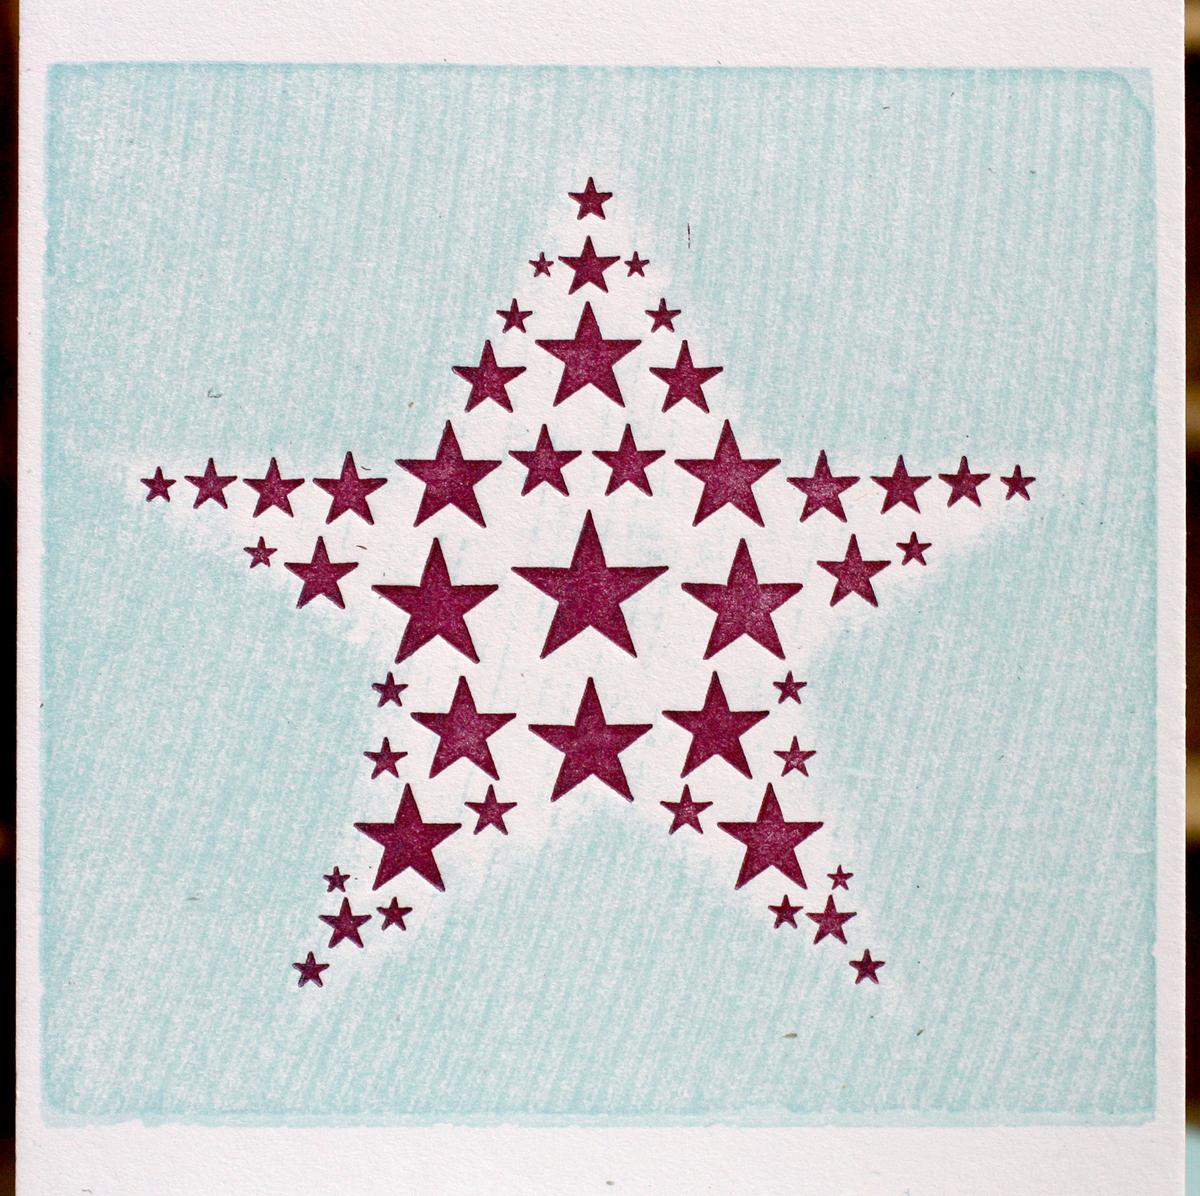 2star3